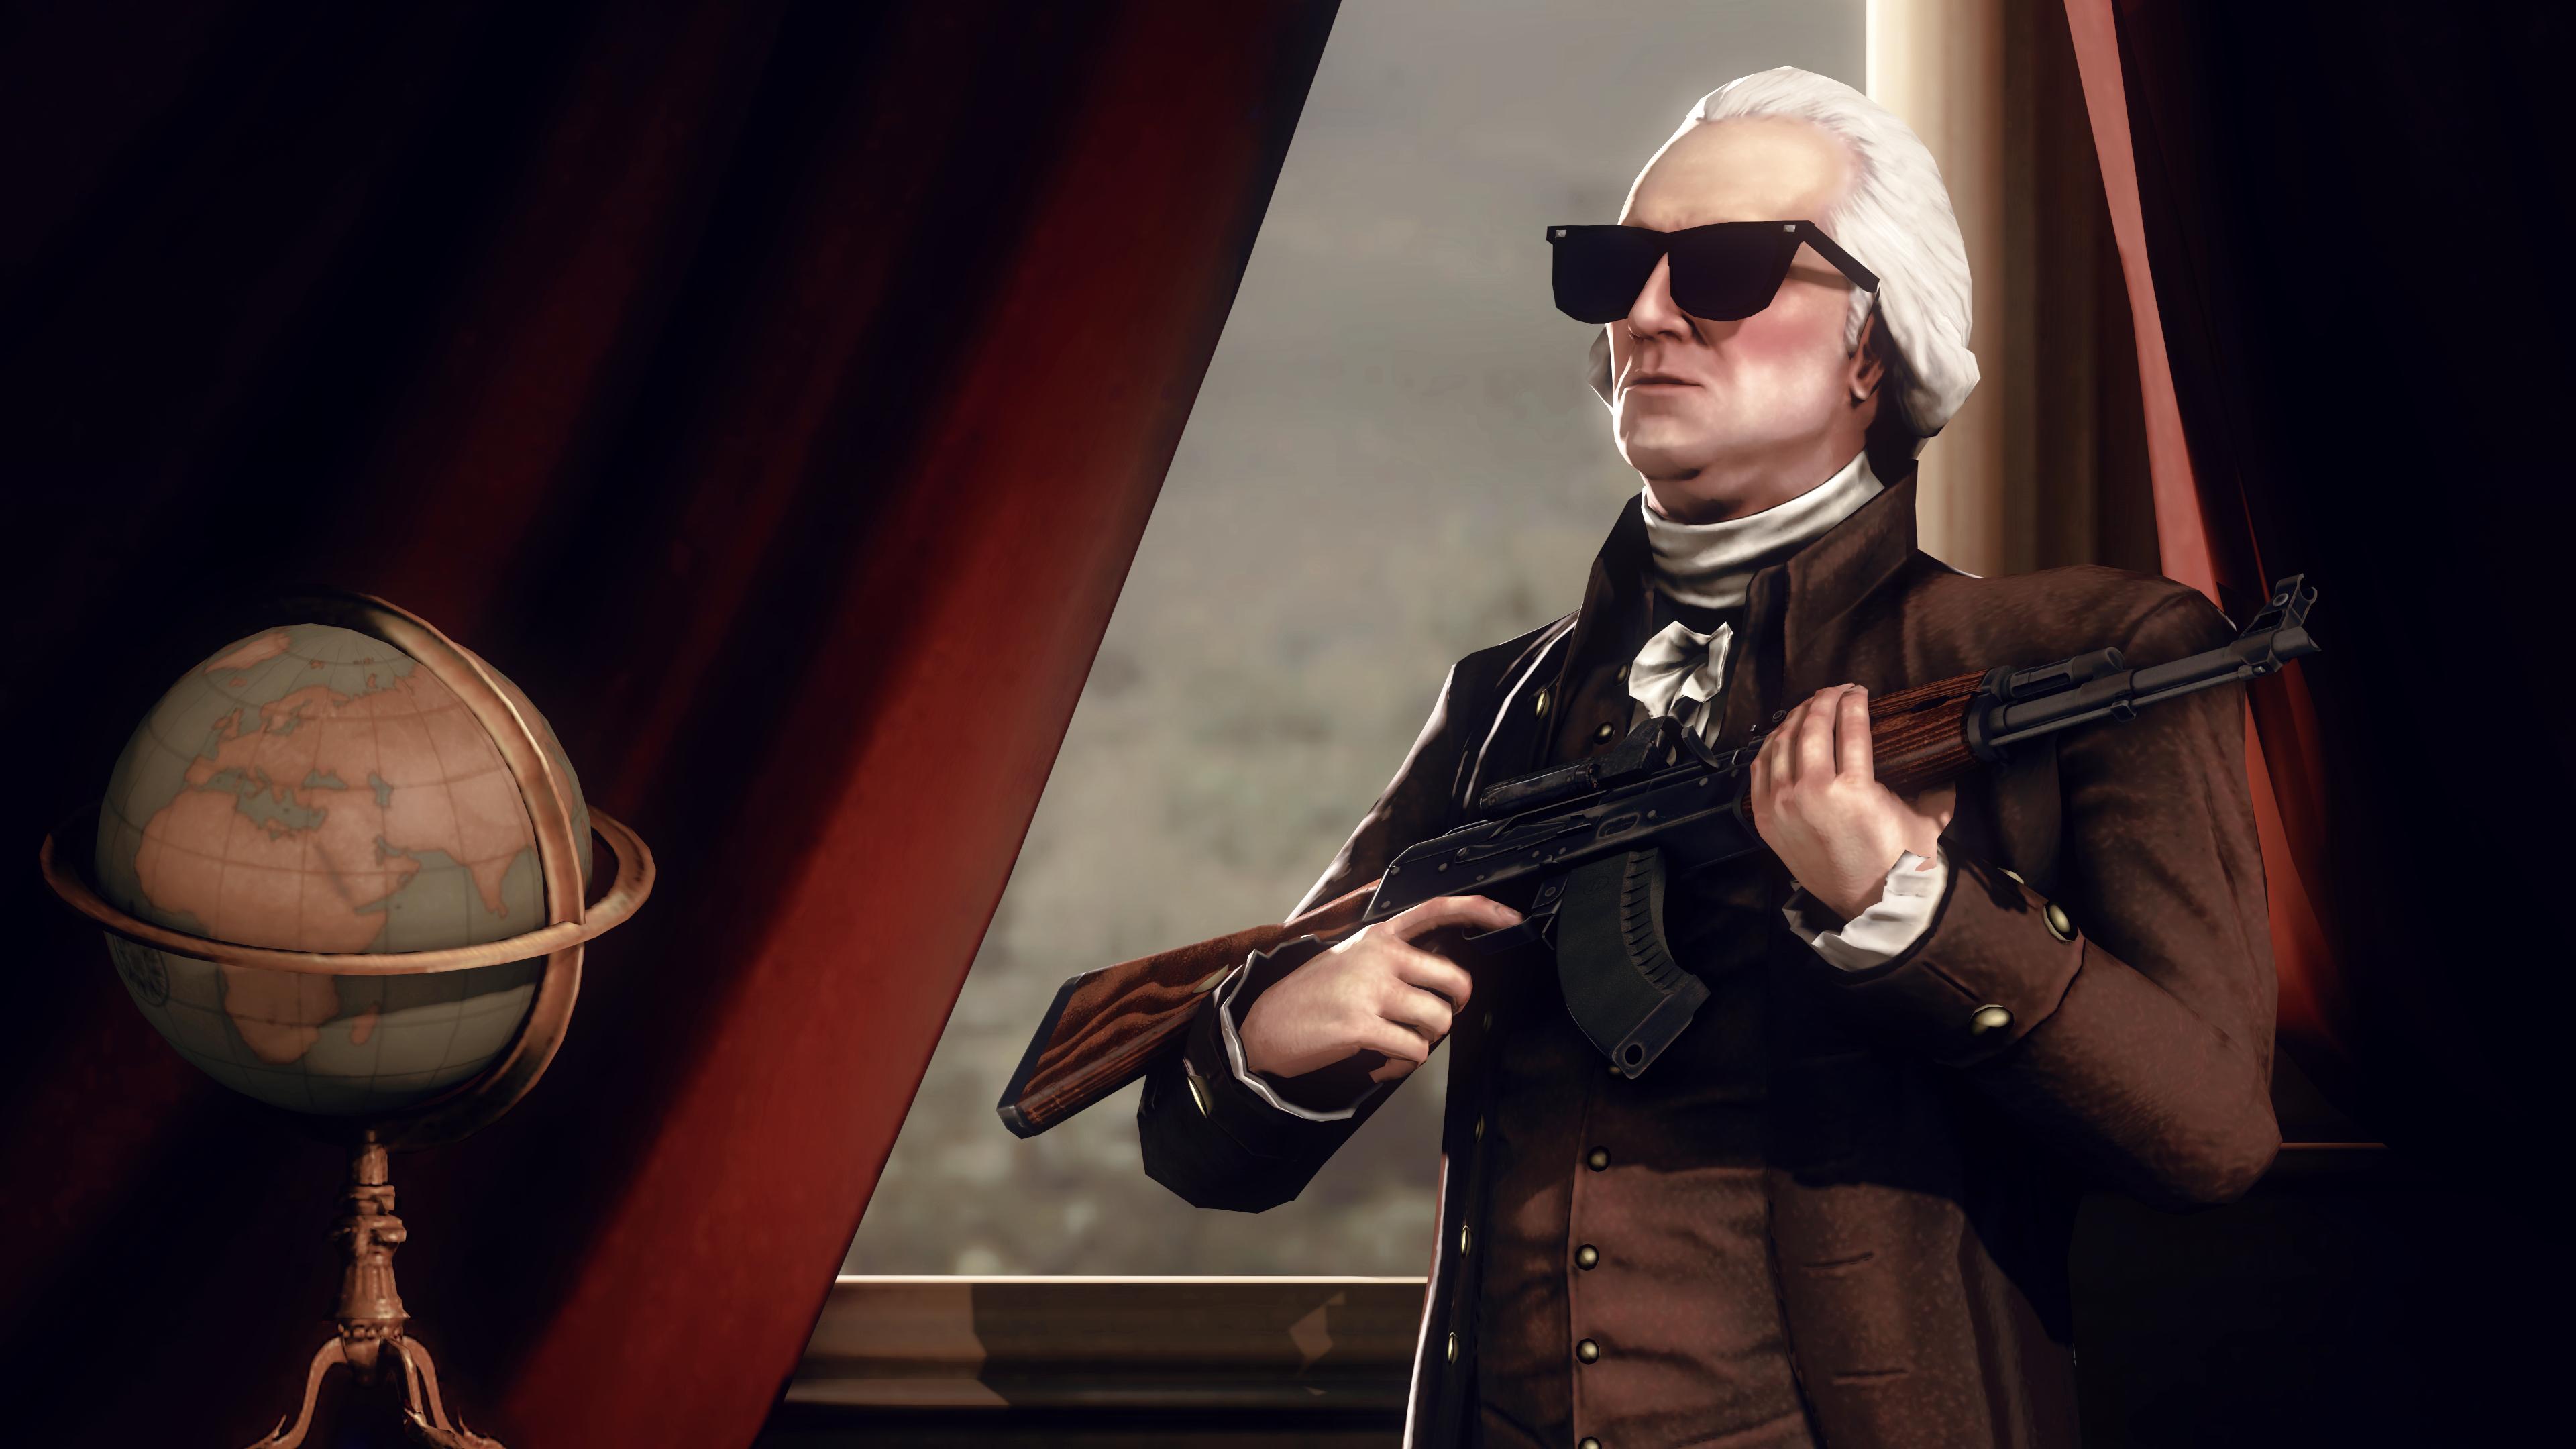 Founding Father by Robogineer on deviantART 3840x2160